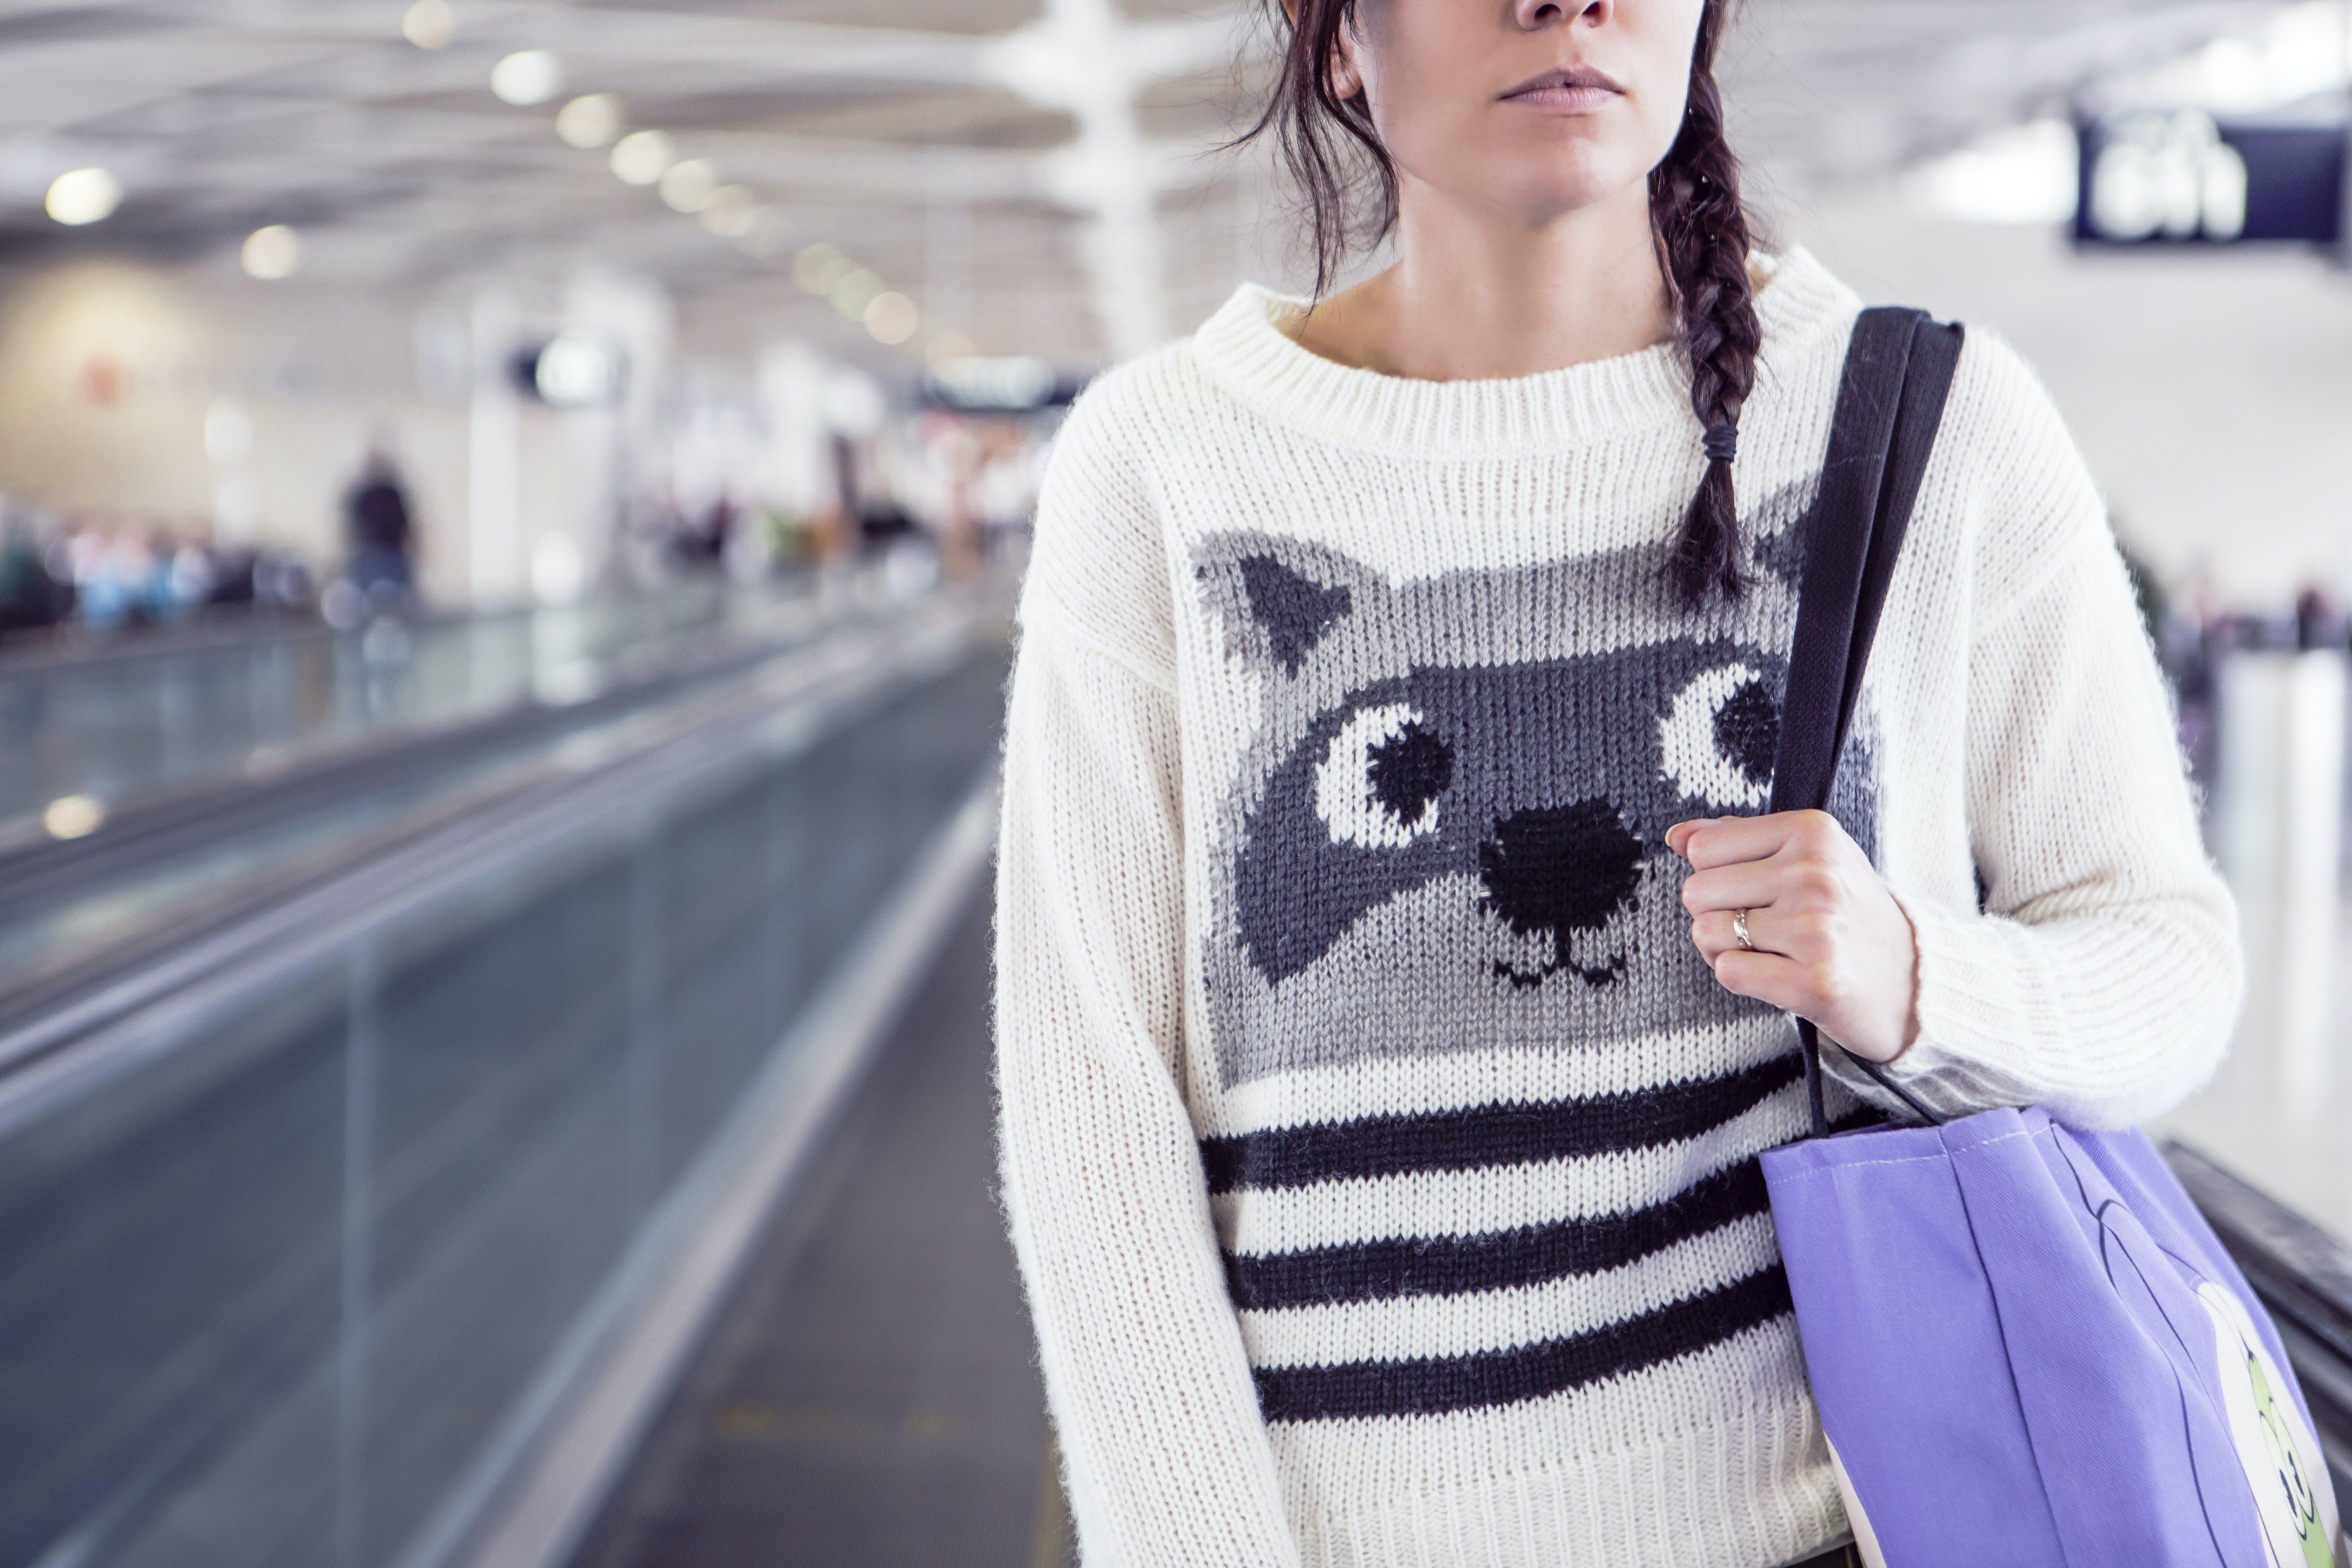 Woman Carrying Purple Shoulder Bag